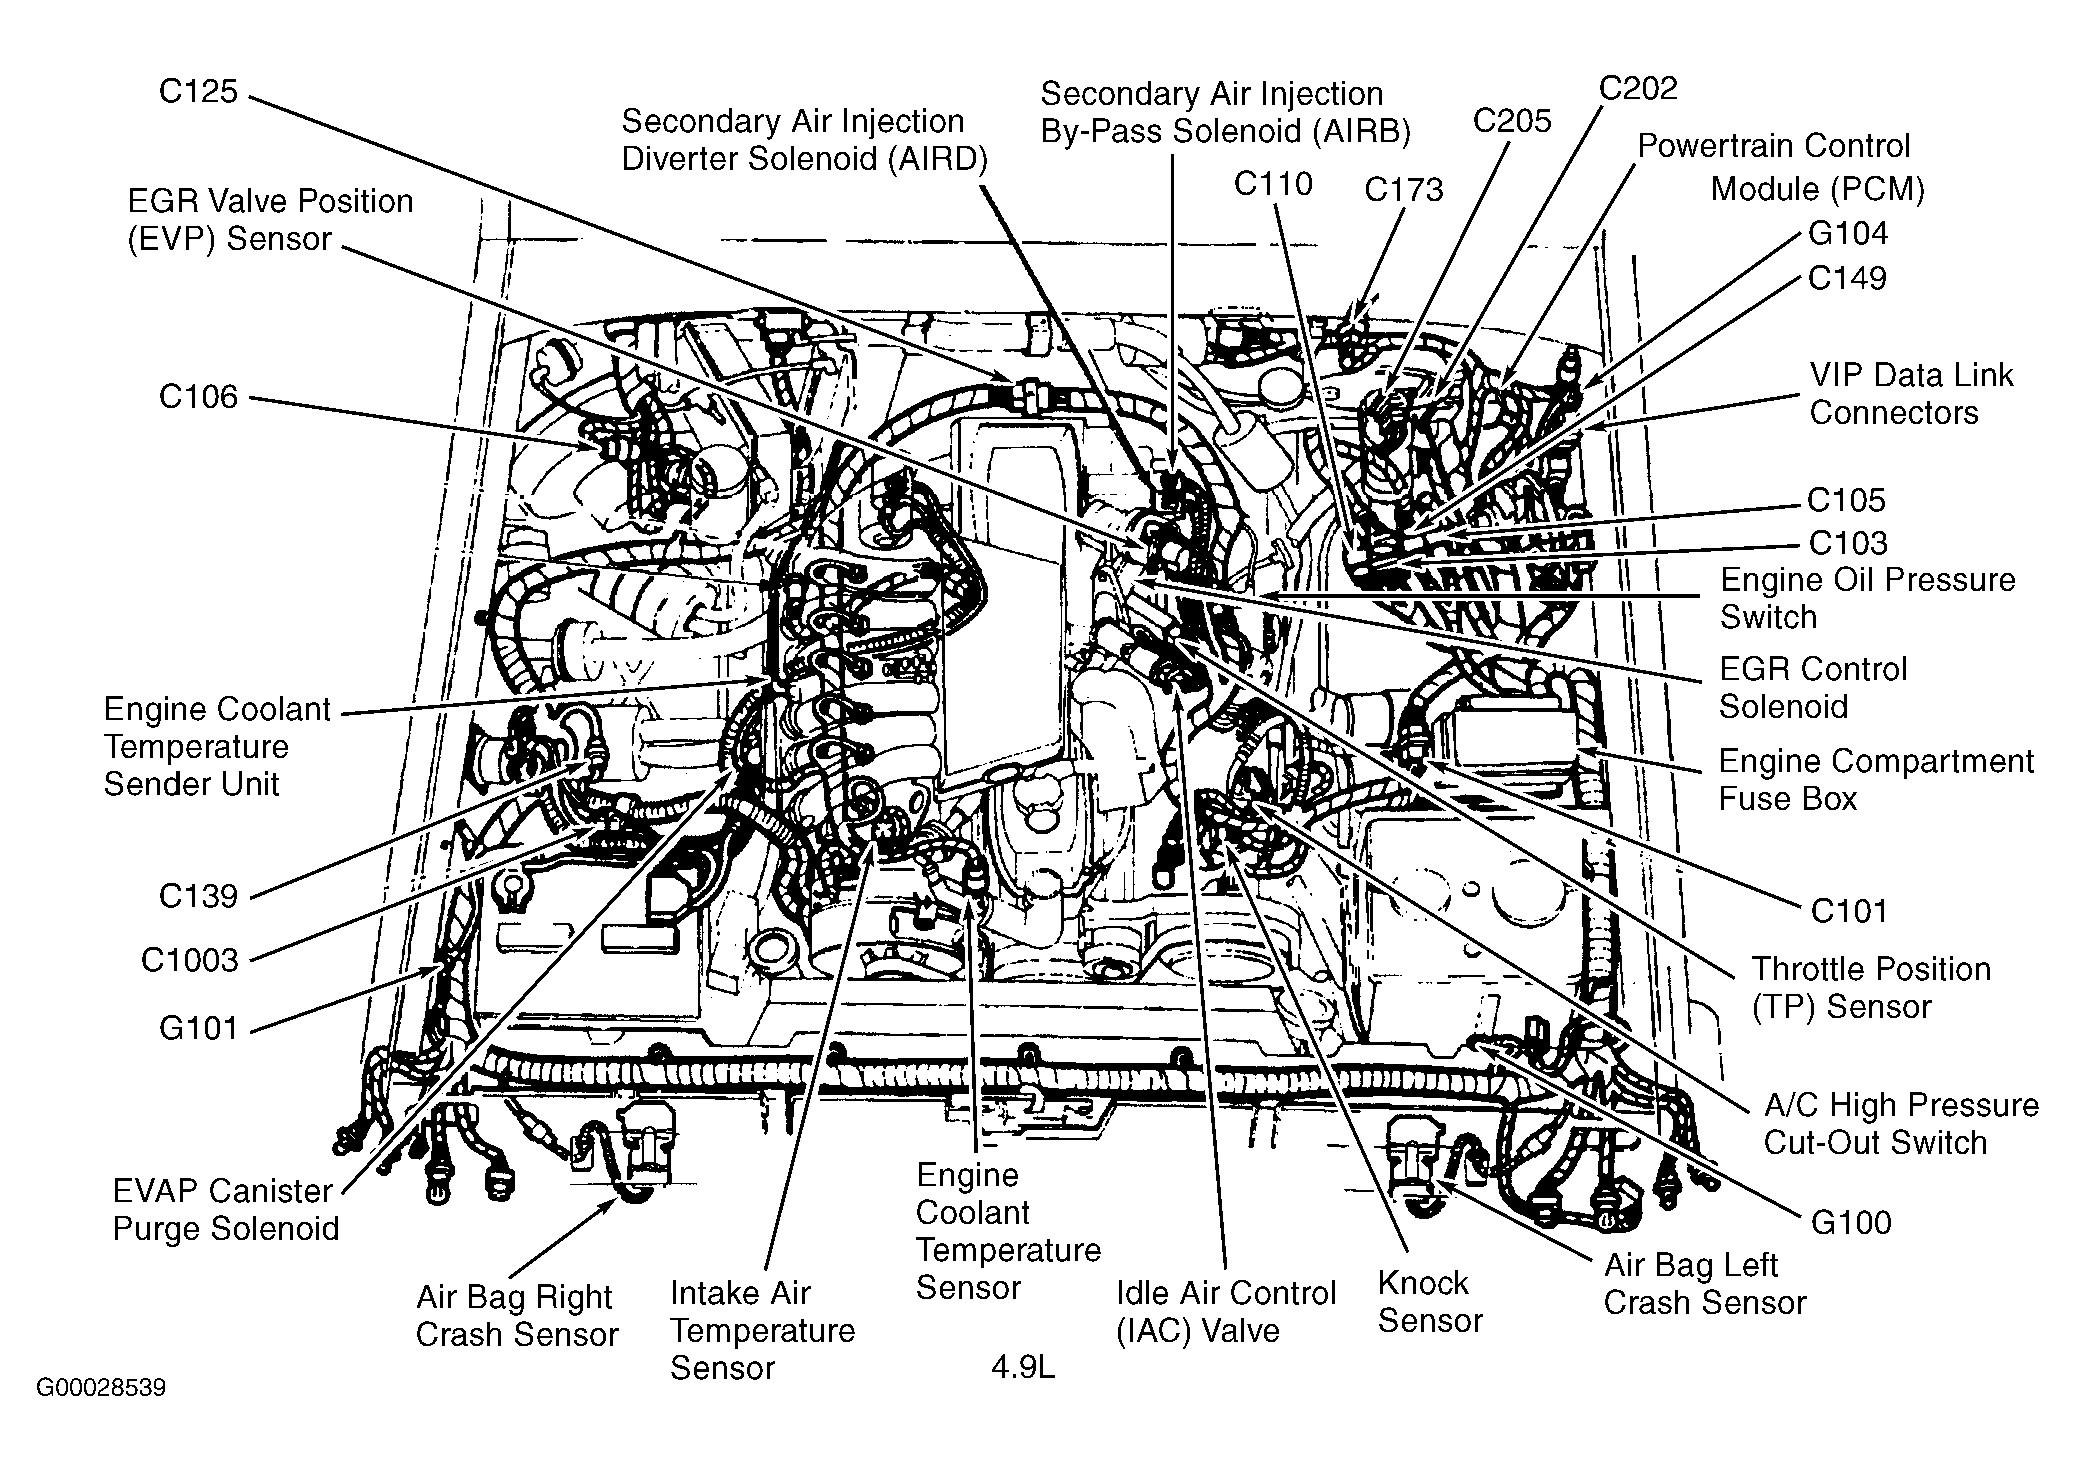 Ford Contour Engine Diagram 1998 ford Contour Transmission Diagram Http Wwwjustanswer Of Ford Contour Engine Diagram